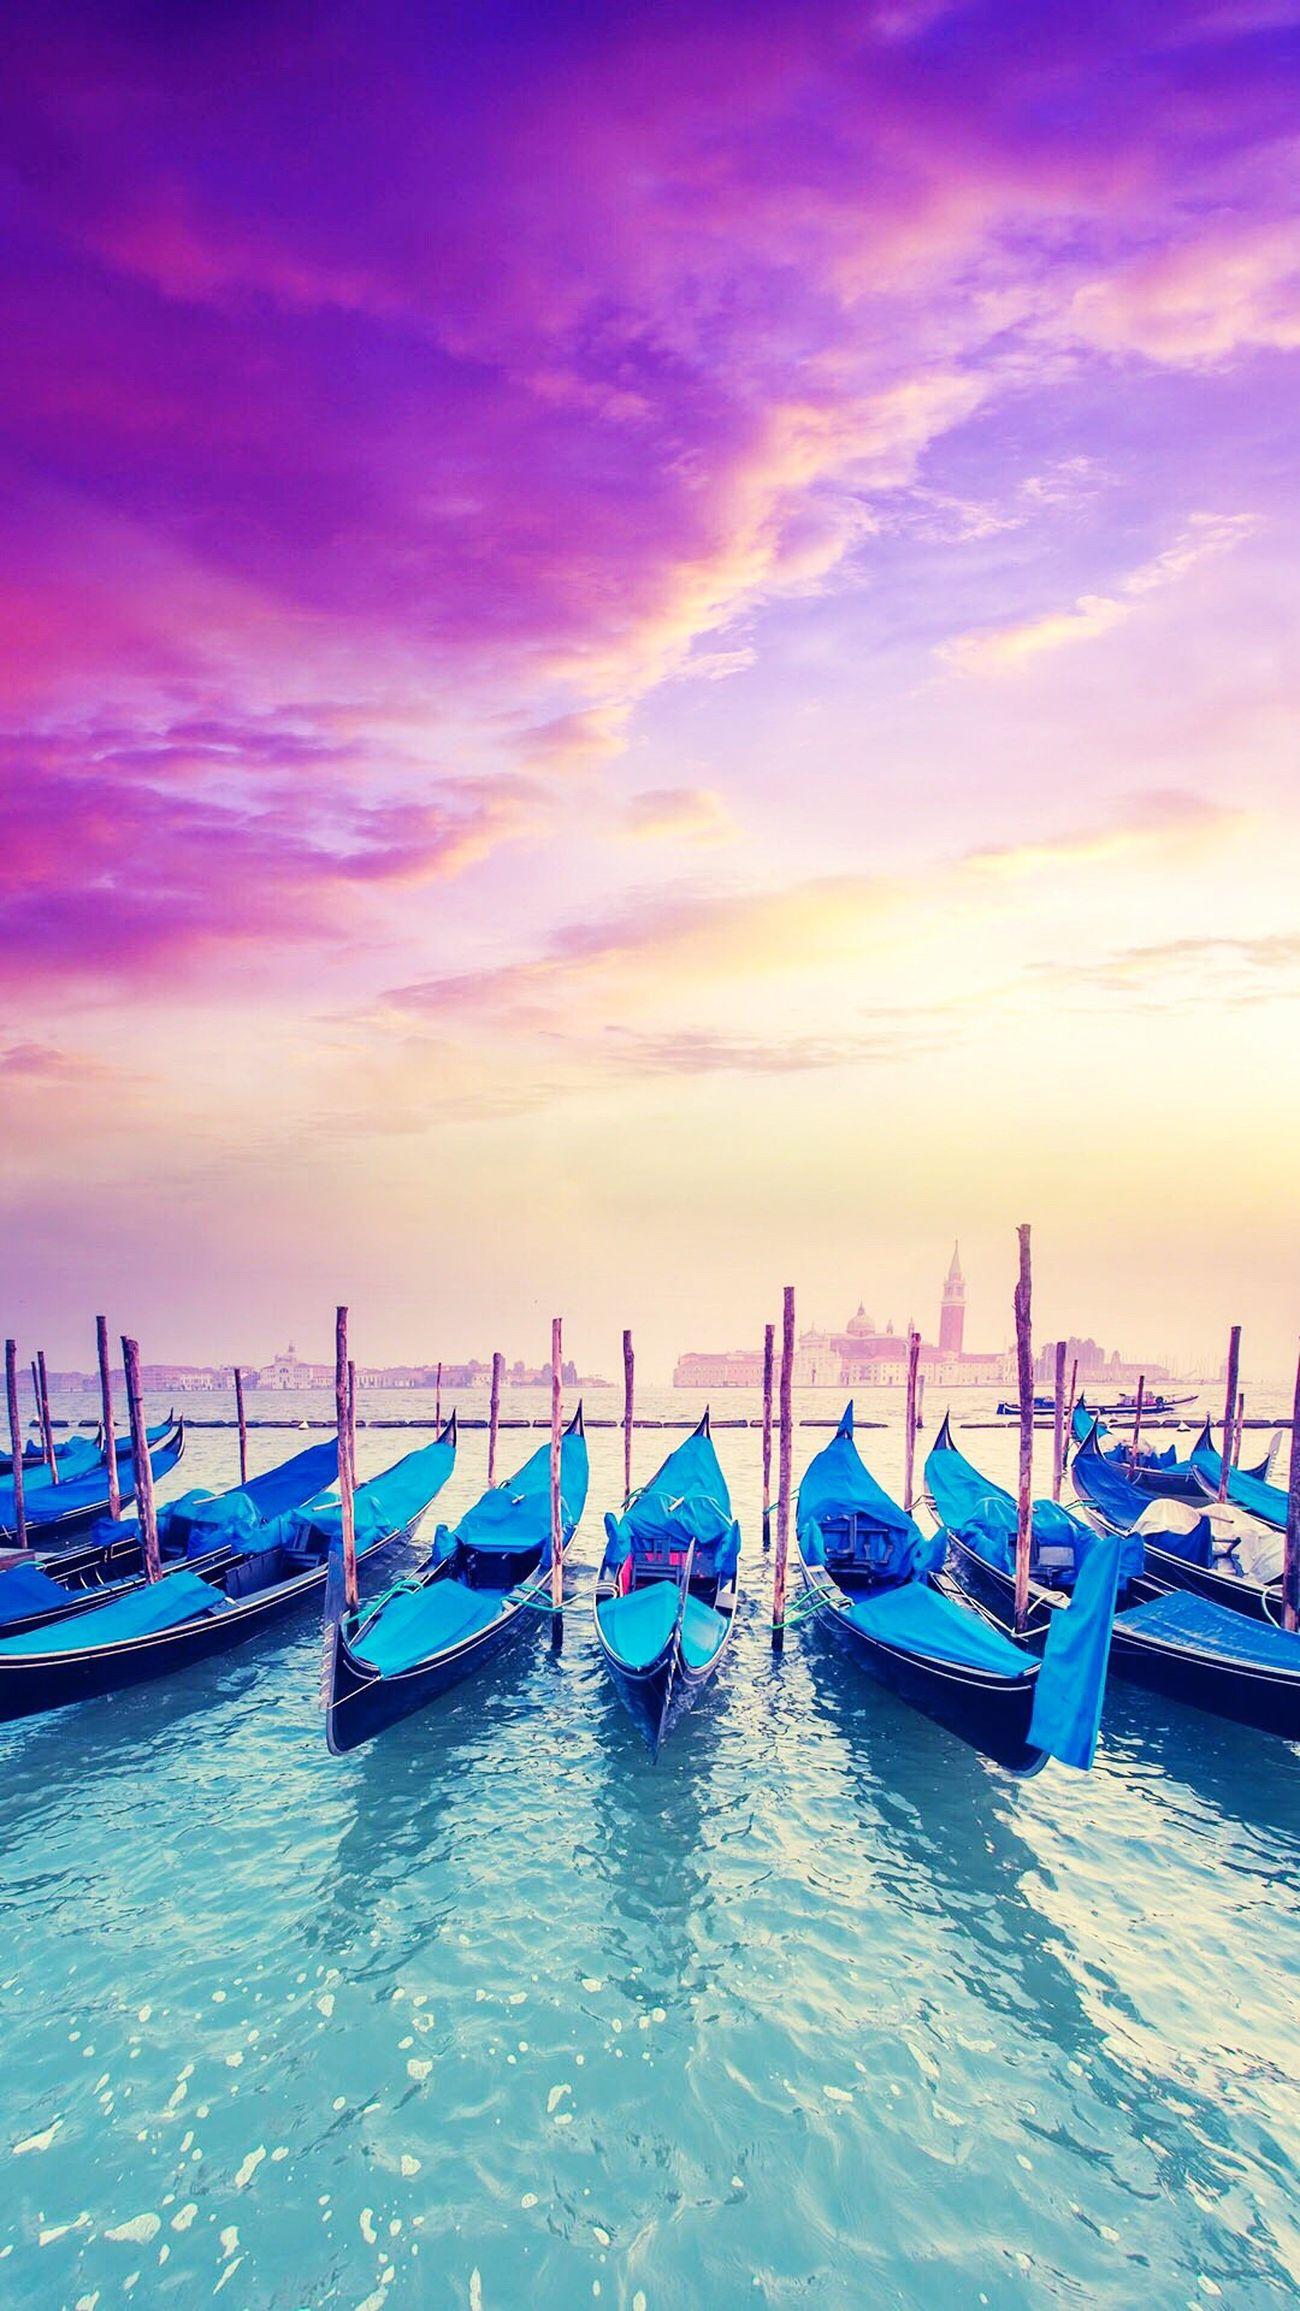 💕🇮🇹✈️☀️ Gondola Venice Photography Scenery Beautiful Italy View Culture Travel Love Romance Ocean Sea Sun Italian Rialtobridge